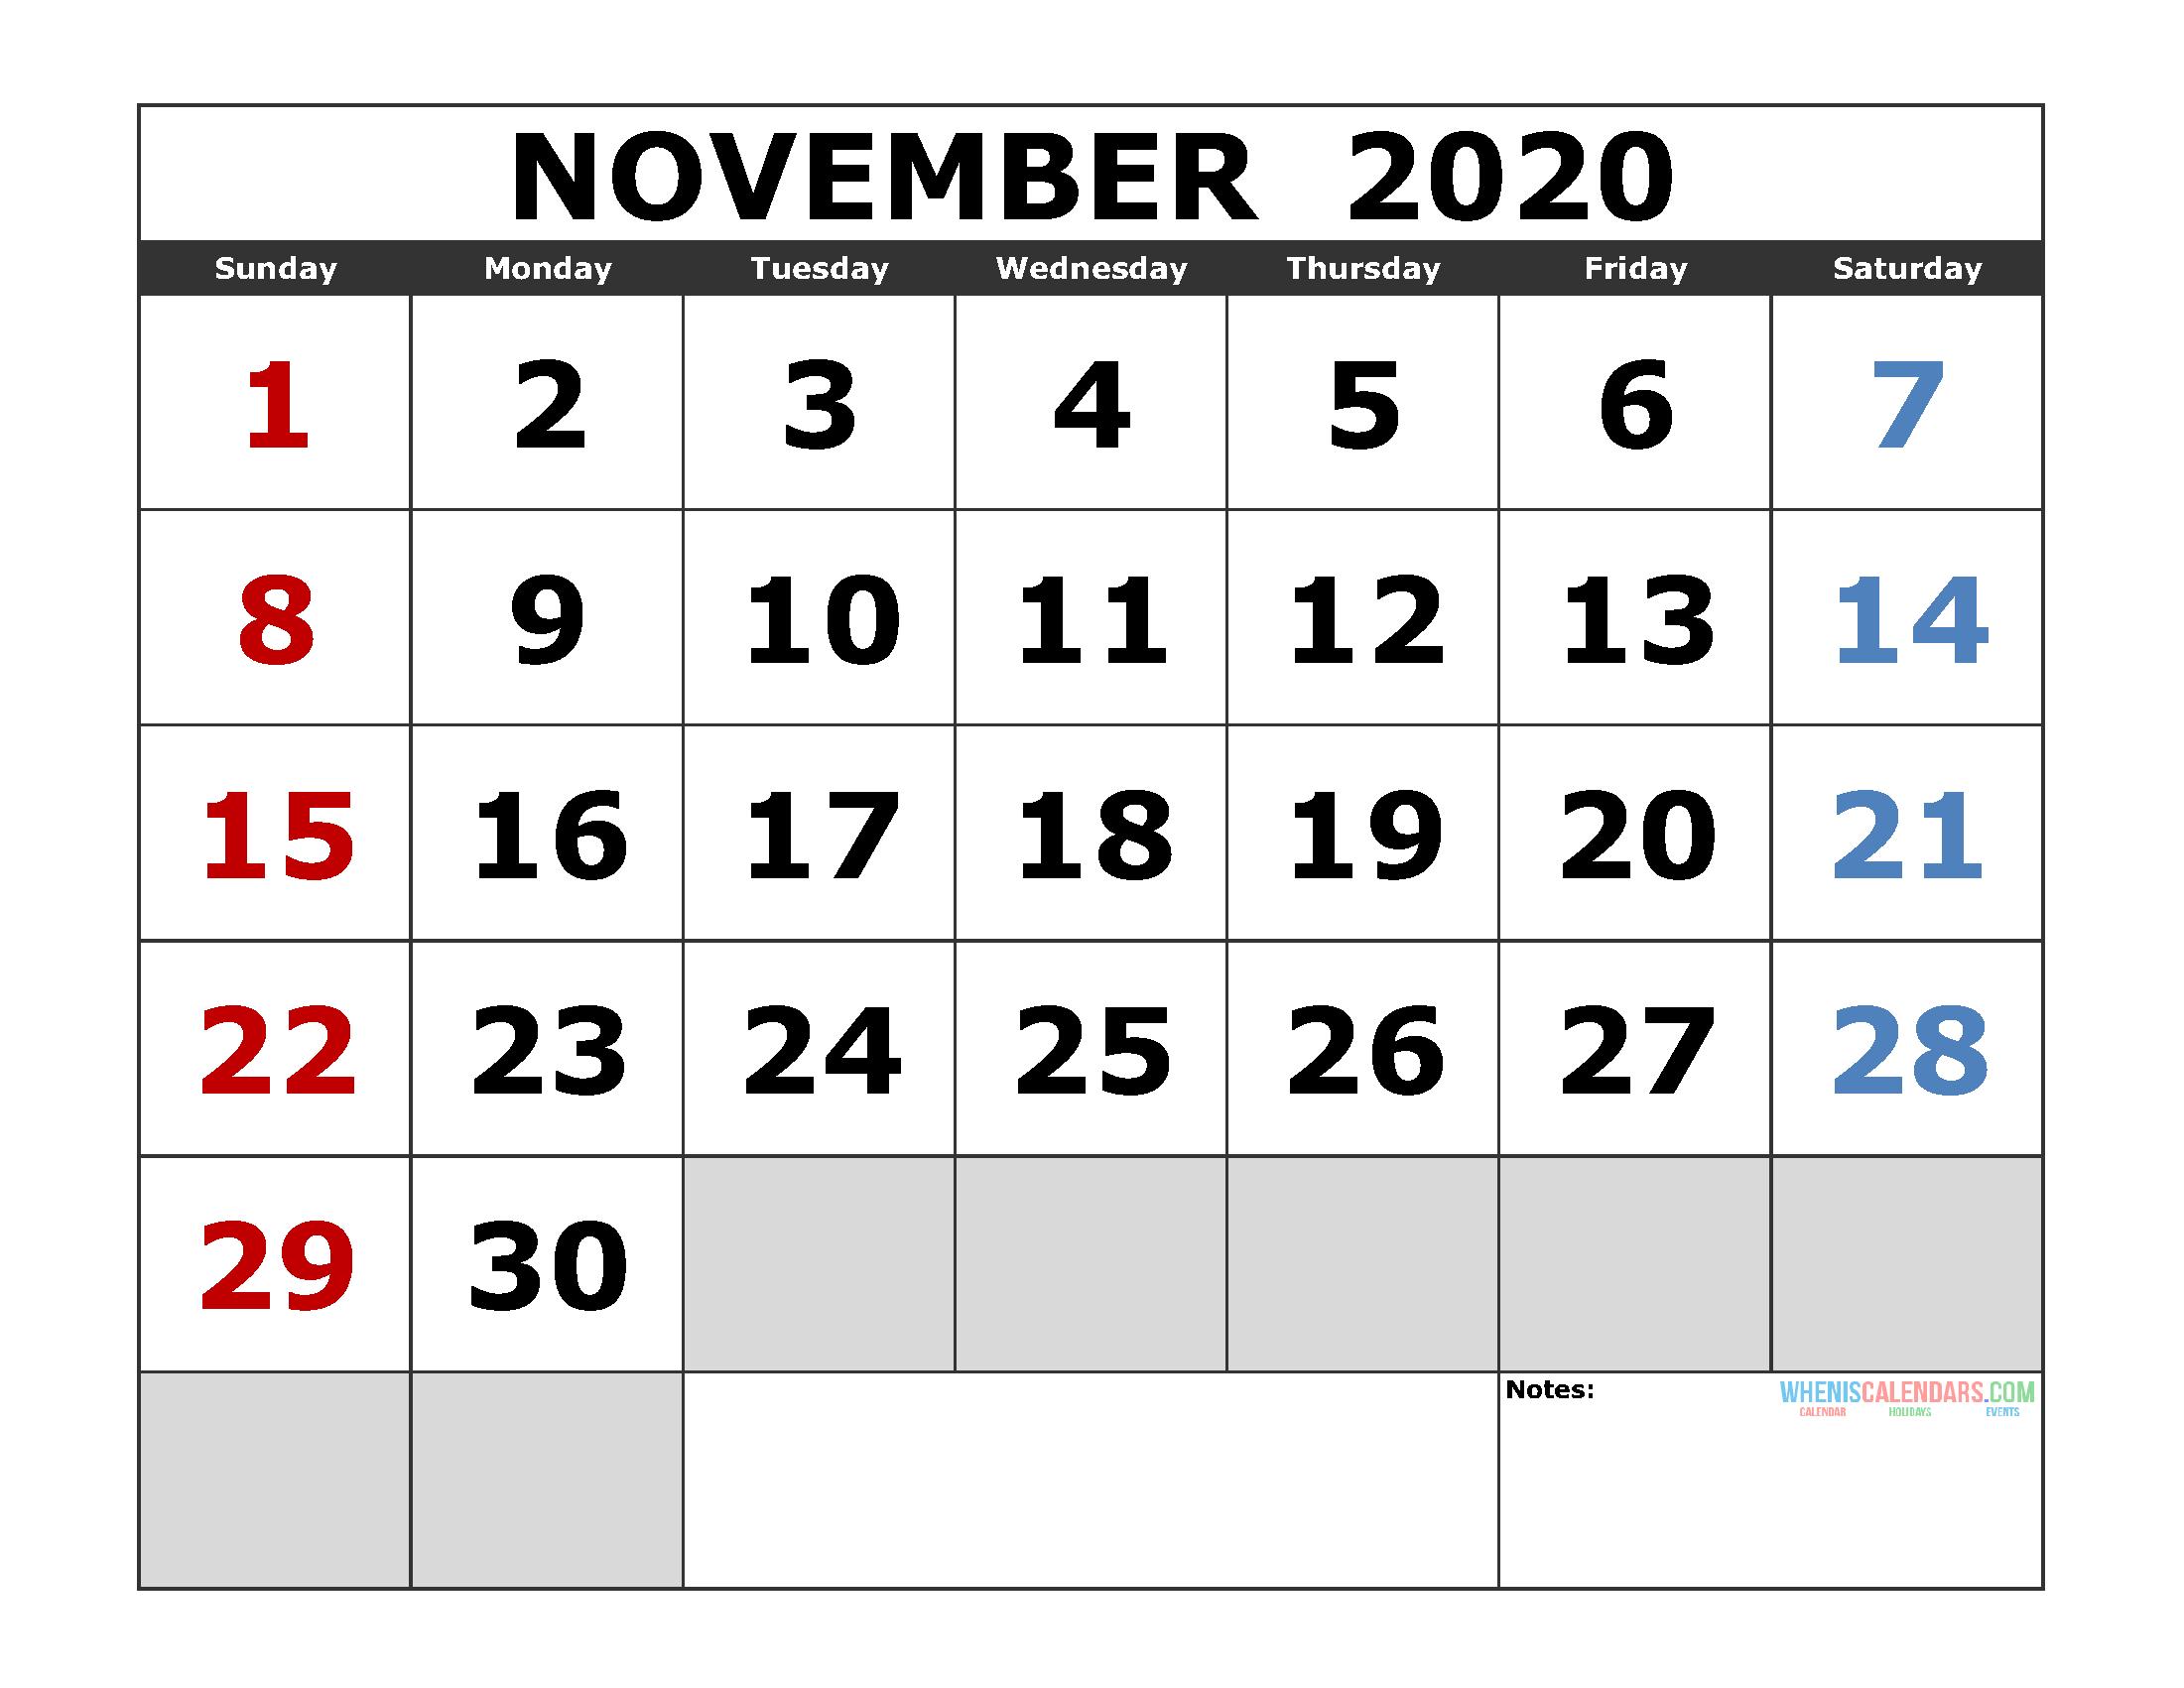 November 2020 Printable Calendar Template Excel, Pdf, Image